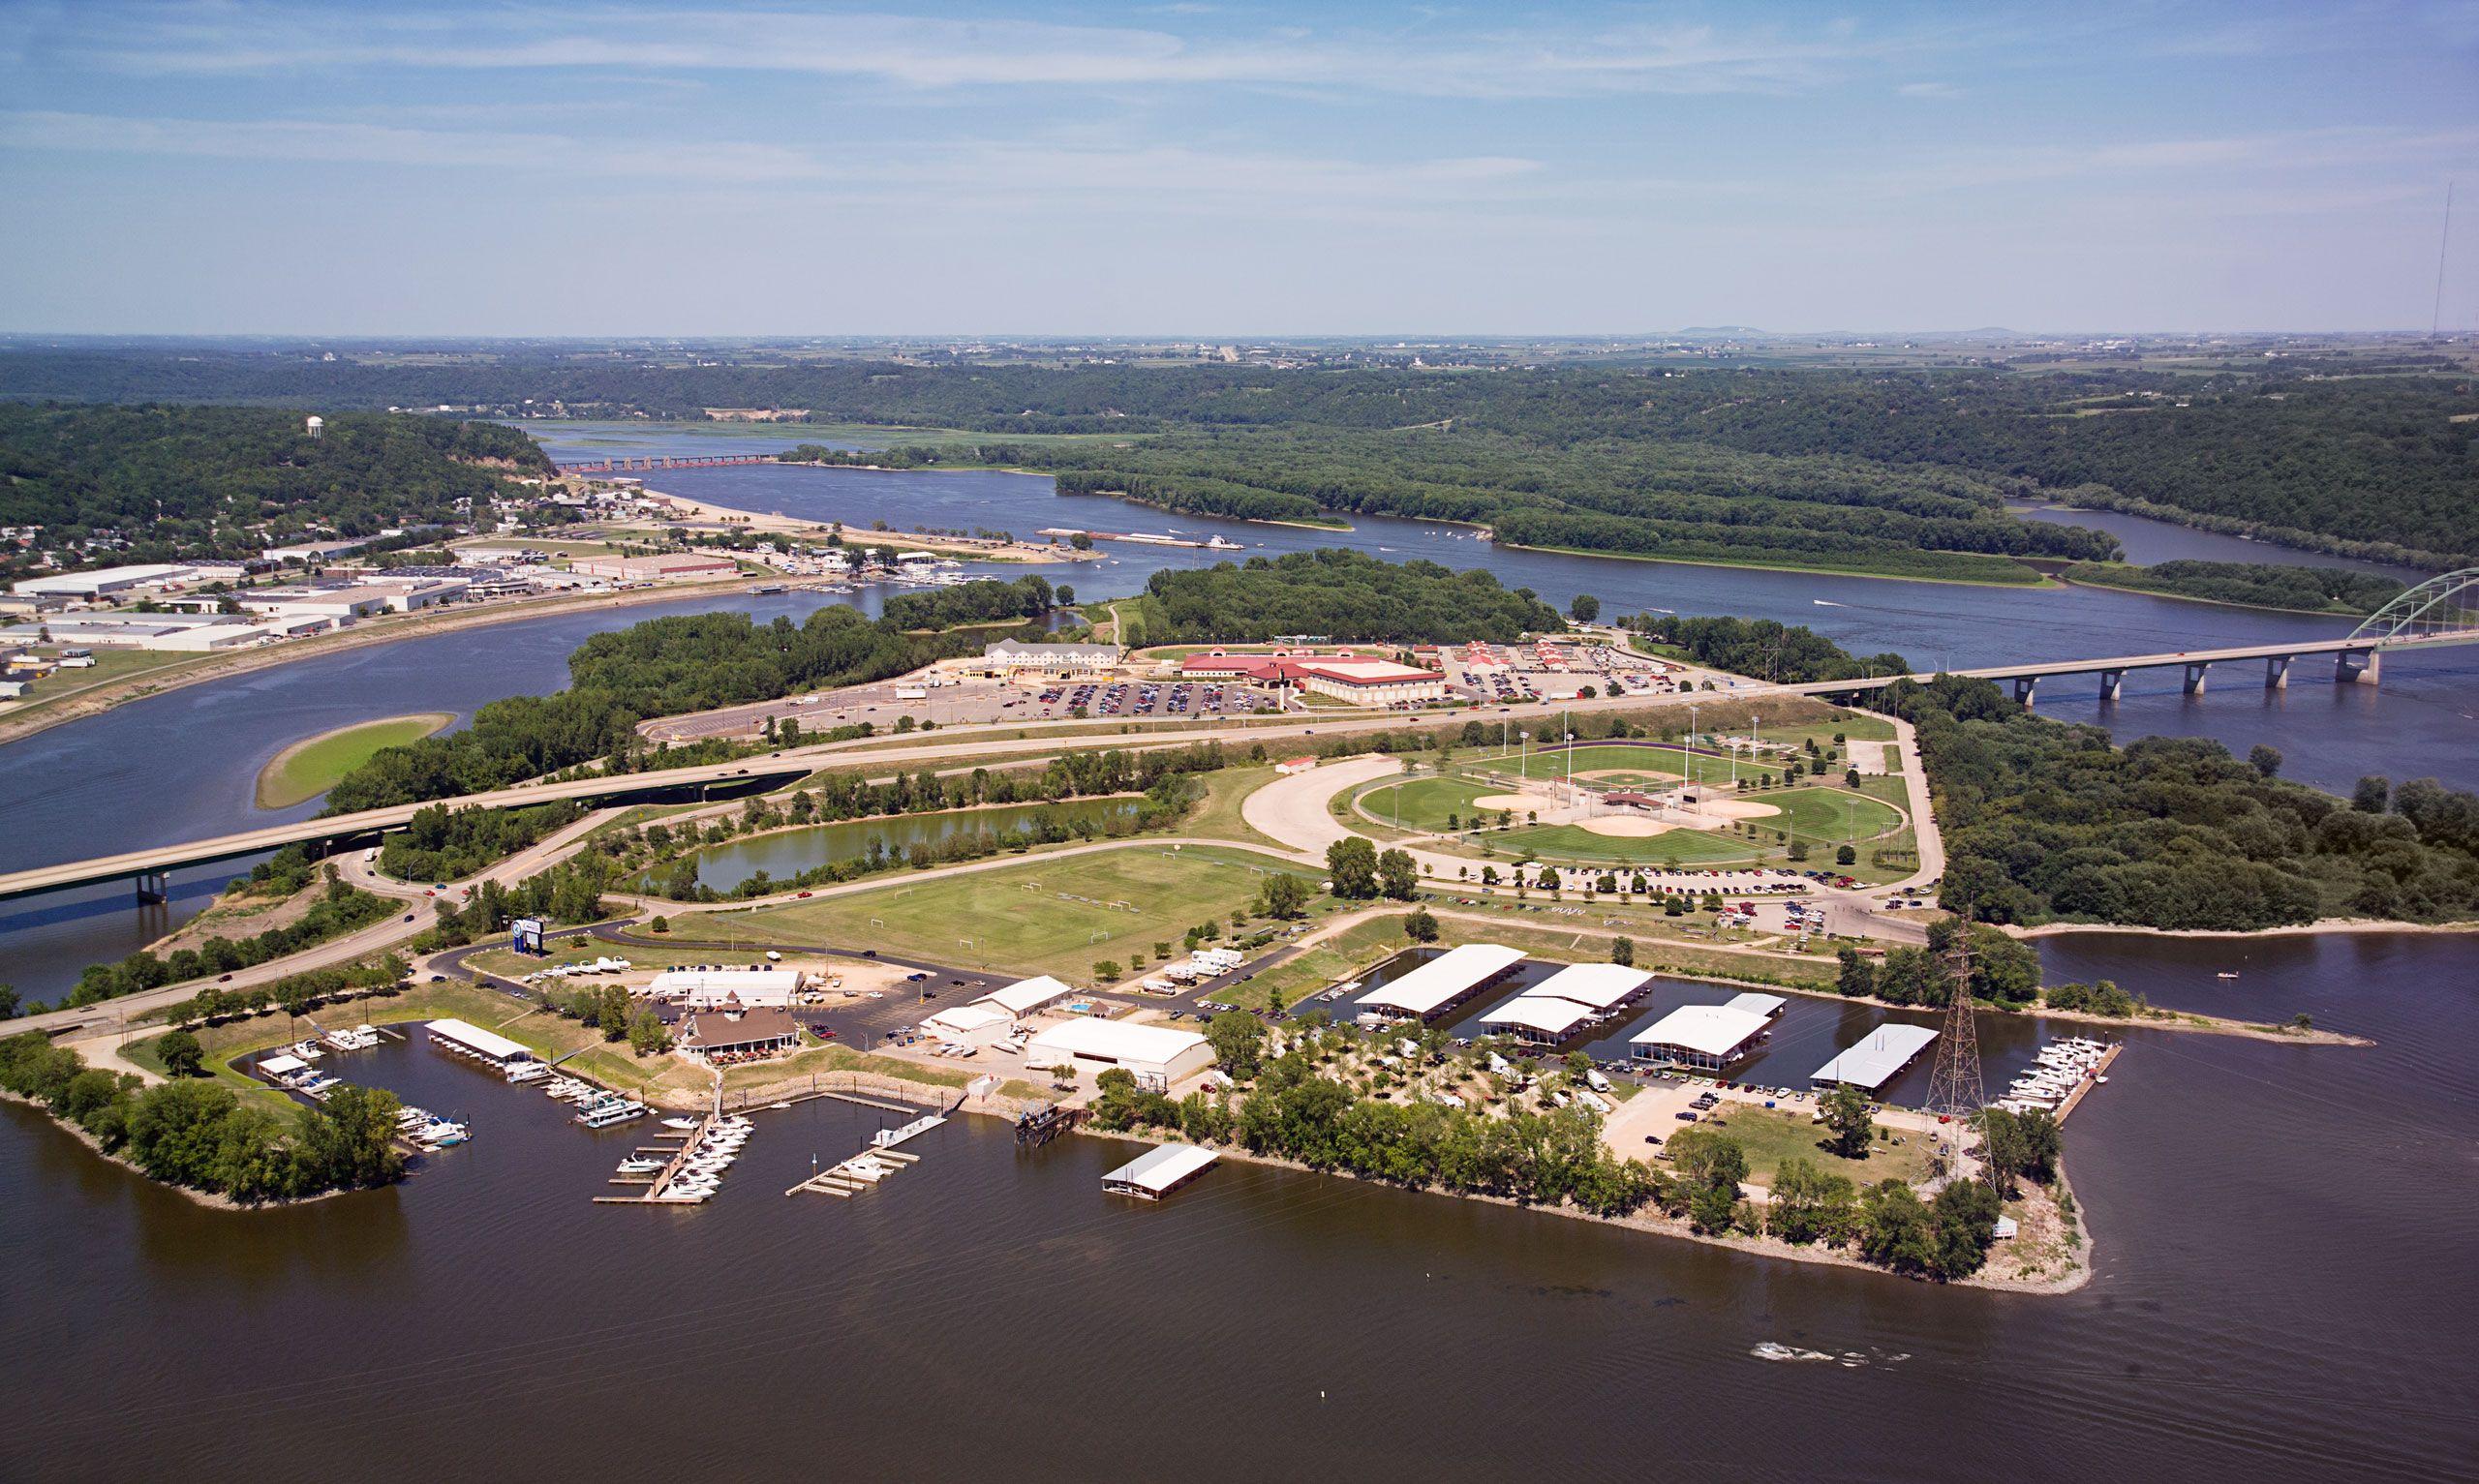 Aerial photograph of City Island & bridge into Wisconsin, Dubuque, Iowa